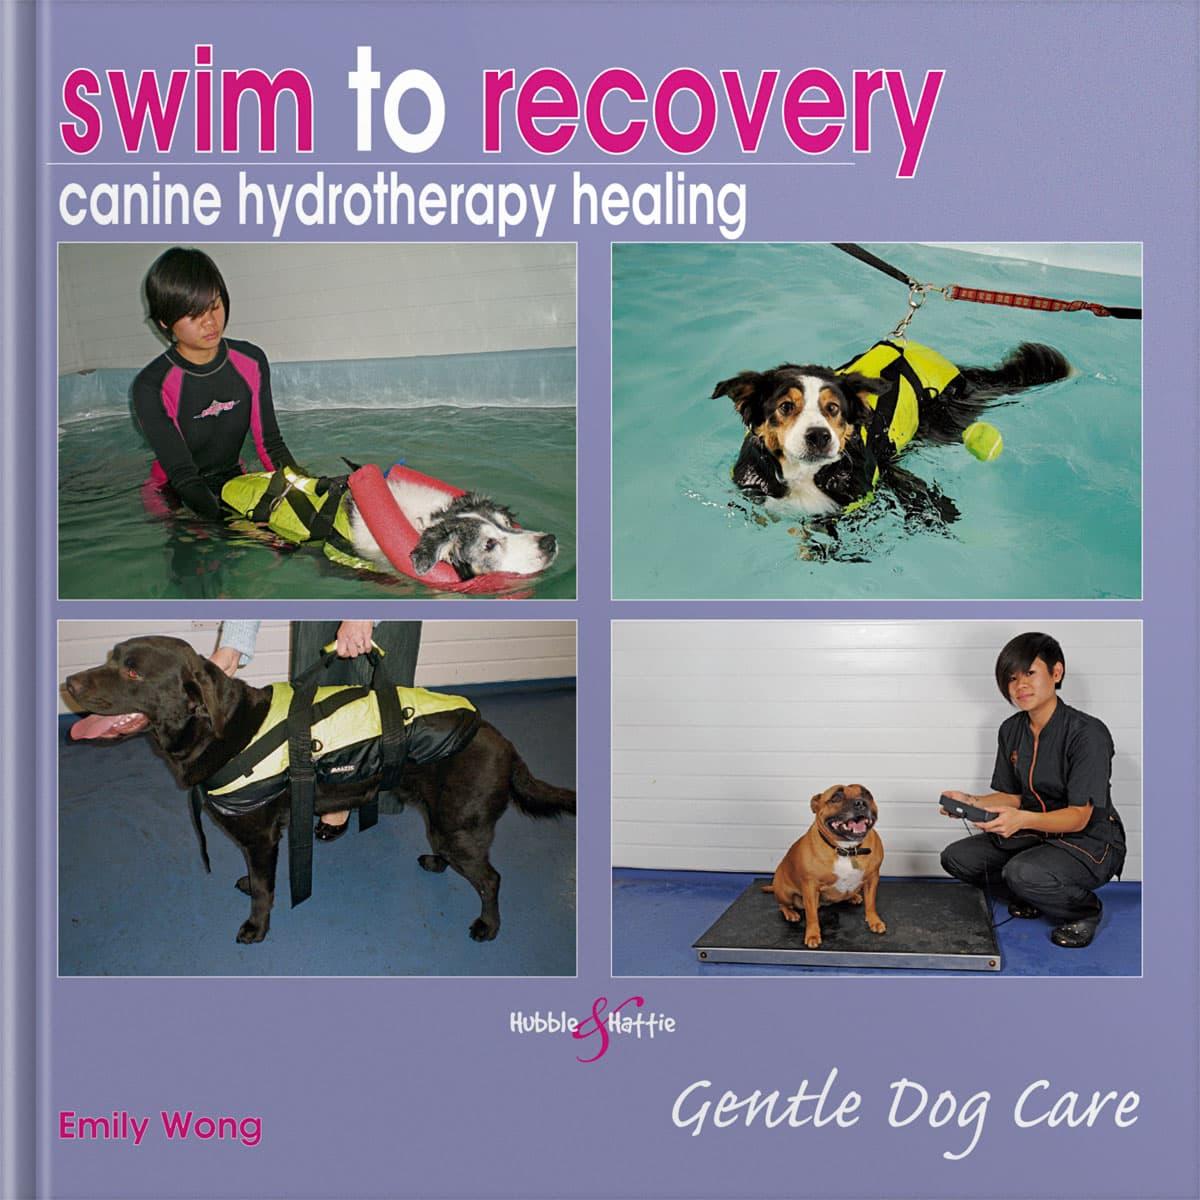 Swim to recovery